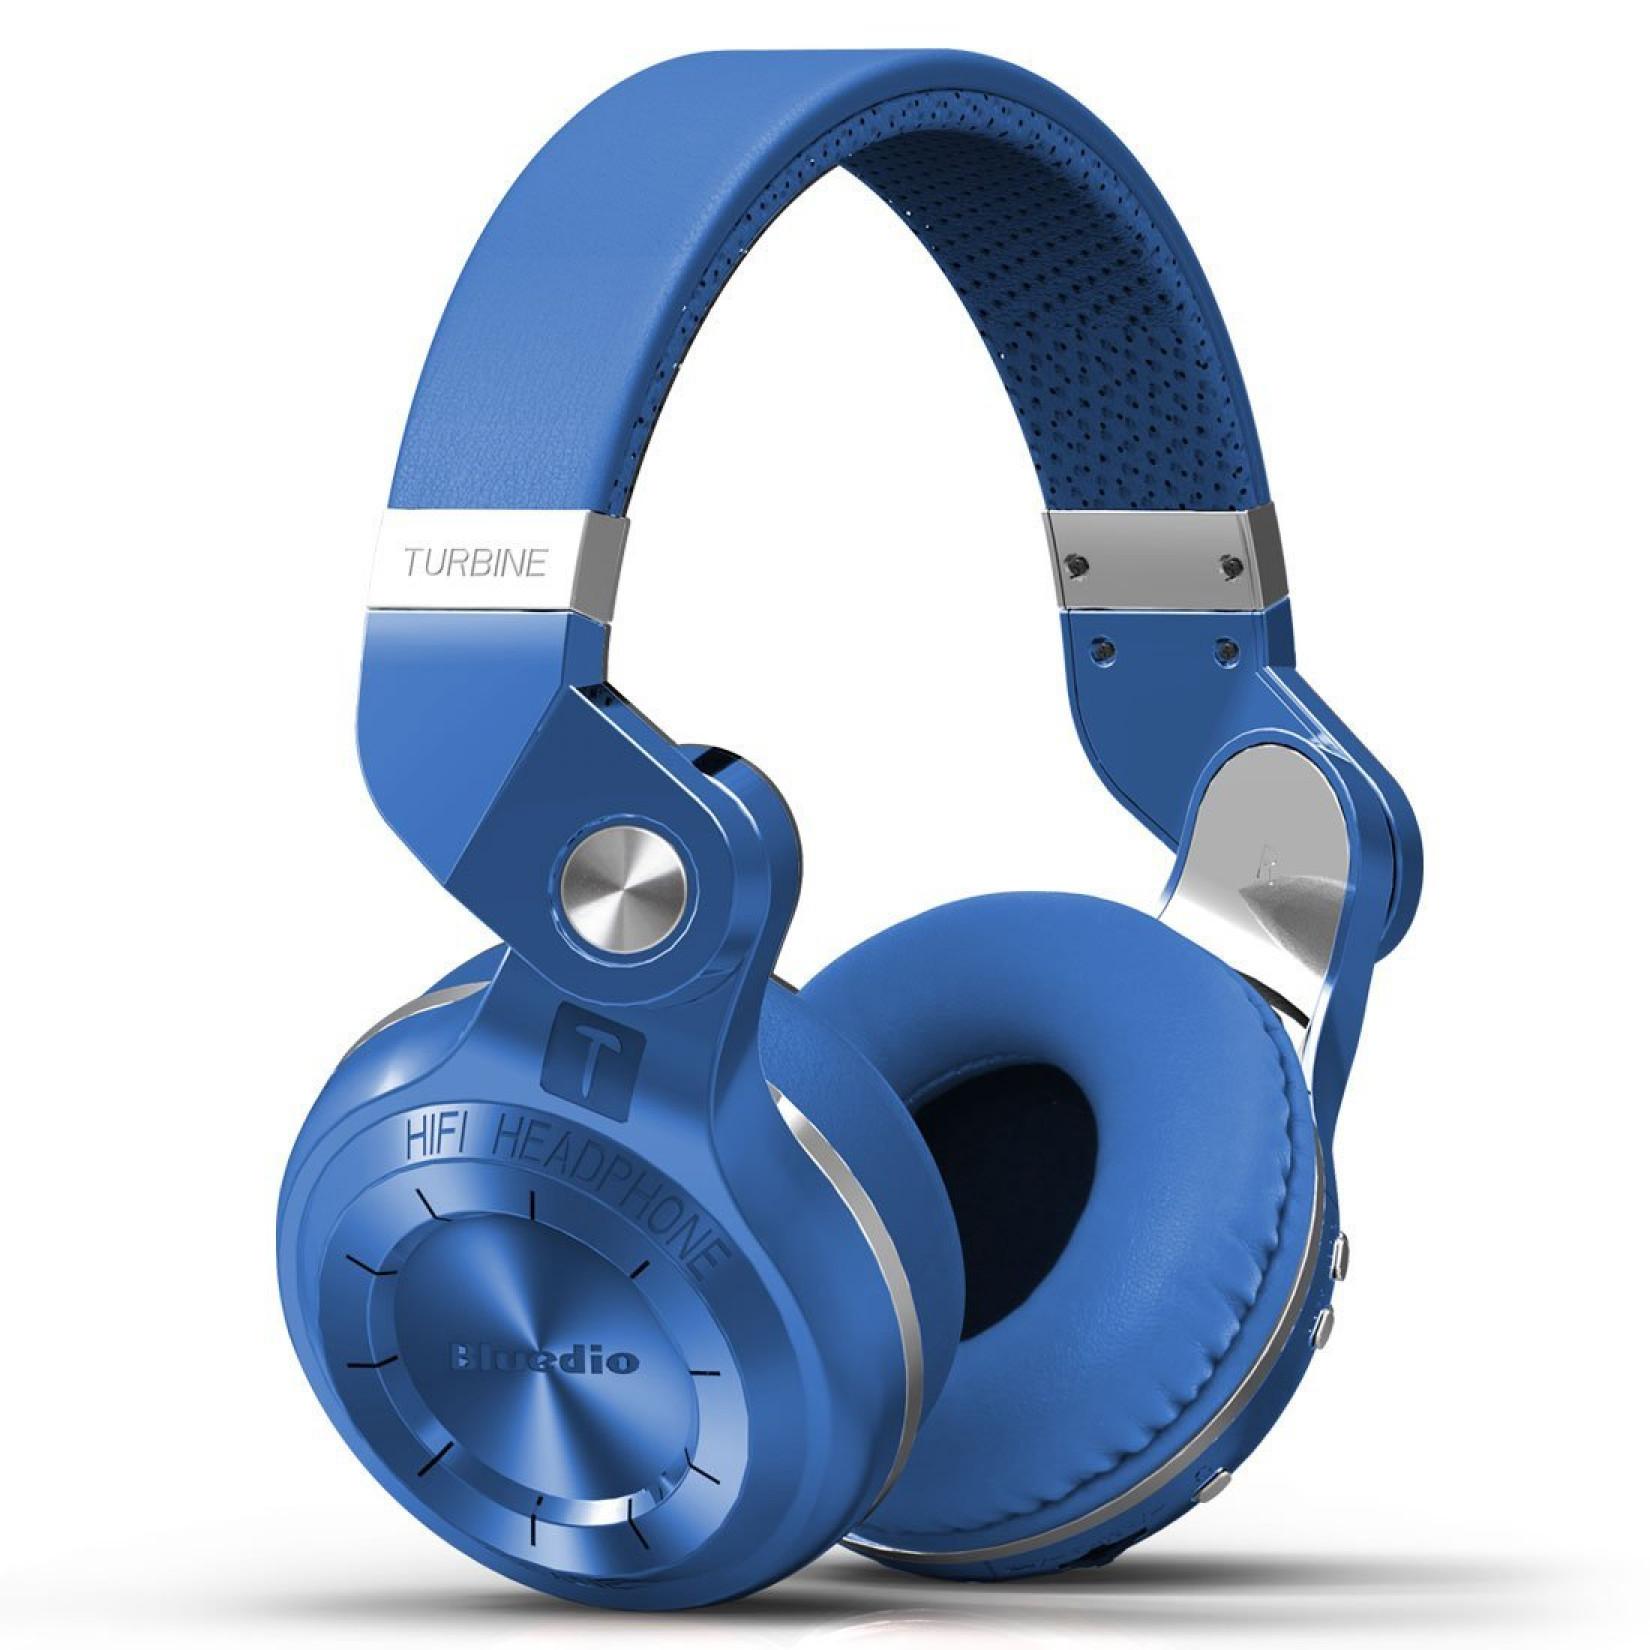 Bluetooth Wireless Headset Over Ear: Bluetooth Stereo Headphones Wireless Headset Over The Ear Gaming Earphones